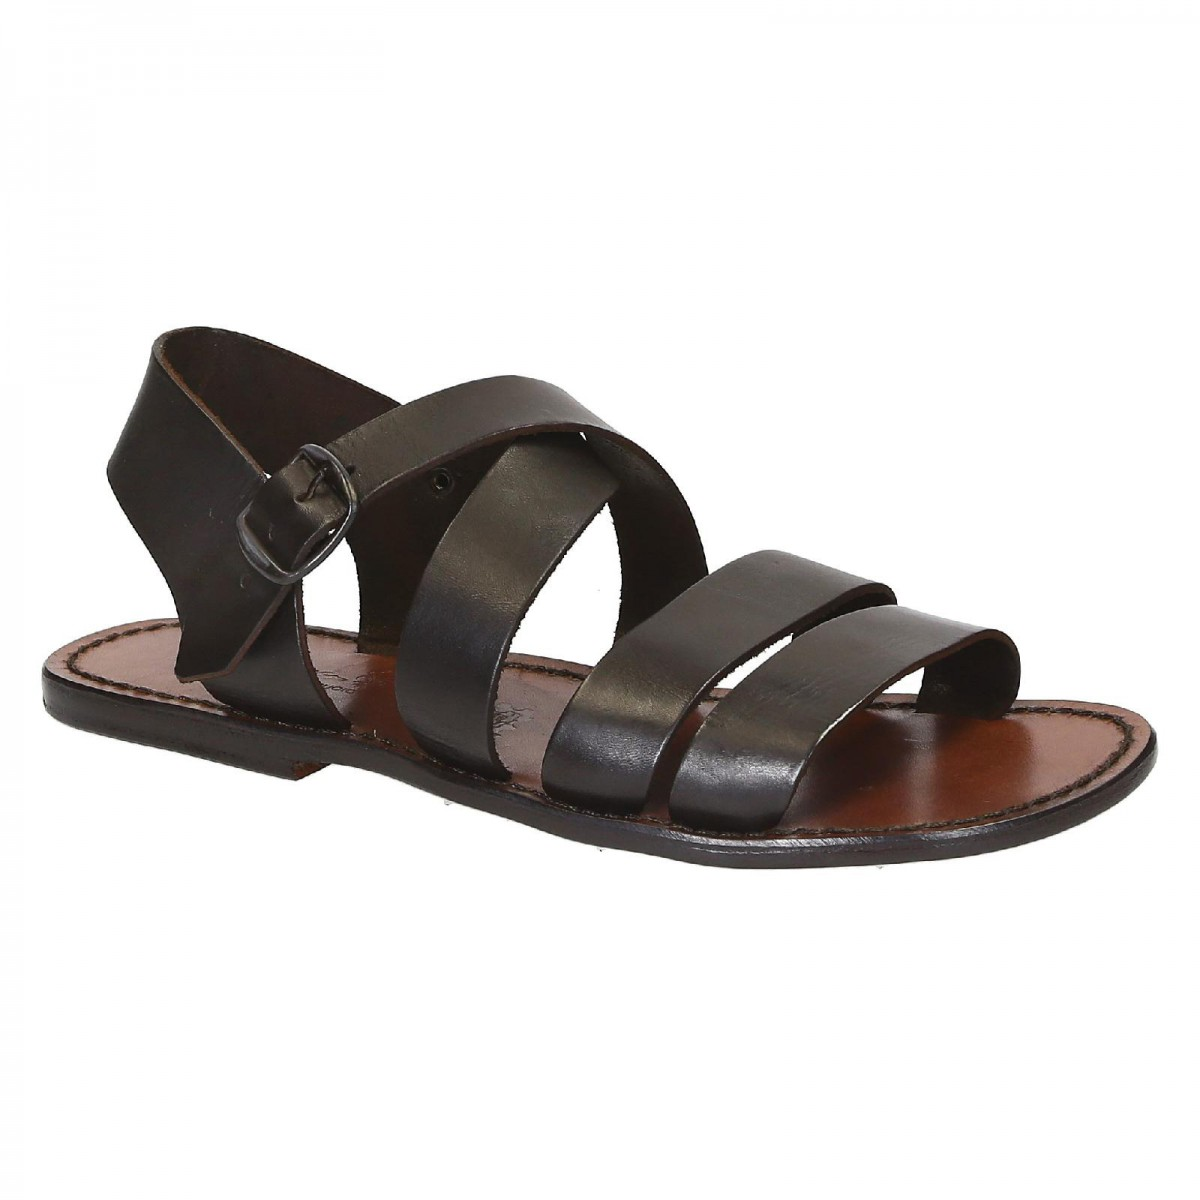 hand gefertigte herren sandalen aus dunkelbraunem leder gianluca das leder handwerker. Black Bedroom Furniture Sets. Home Design Ideas